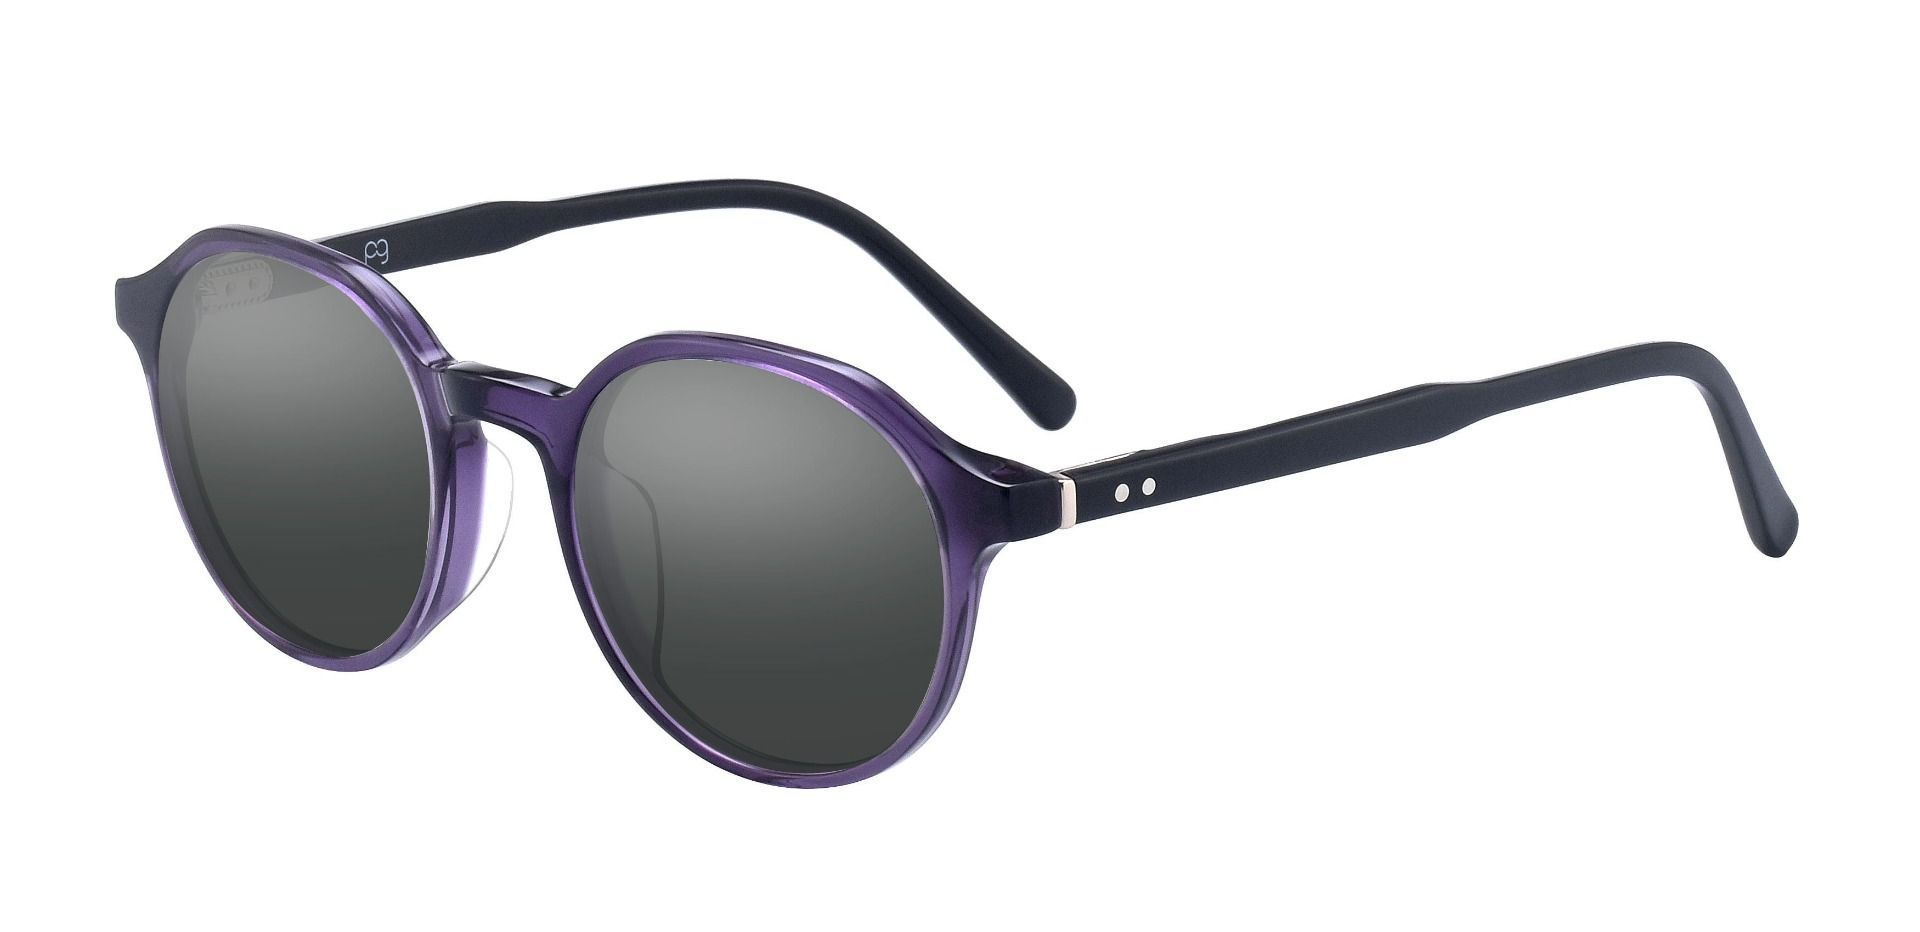 Millie Oval Prescription Sunglasses - Purple Frame With Gray Lenses